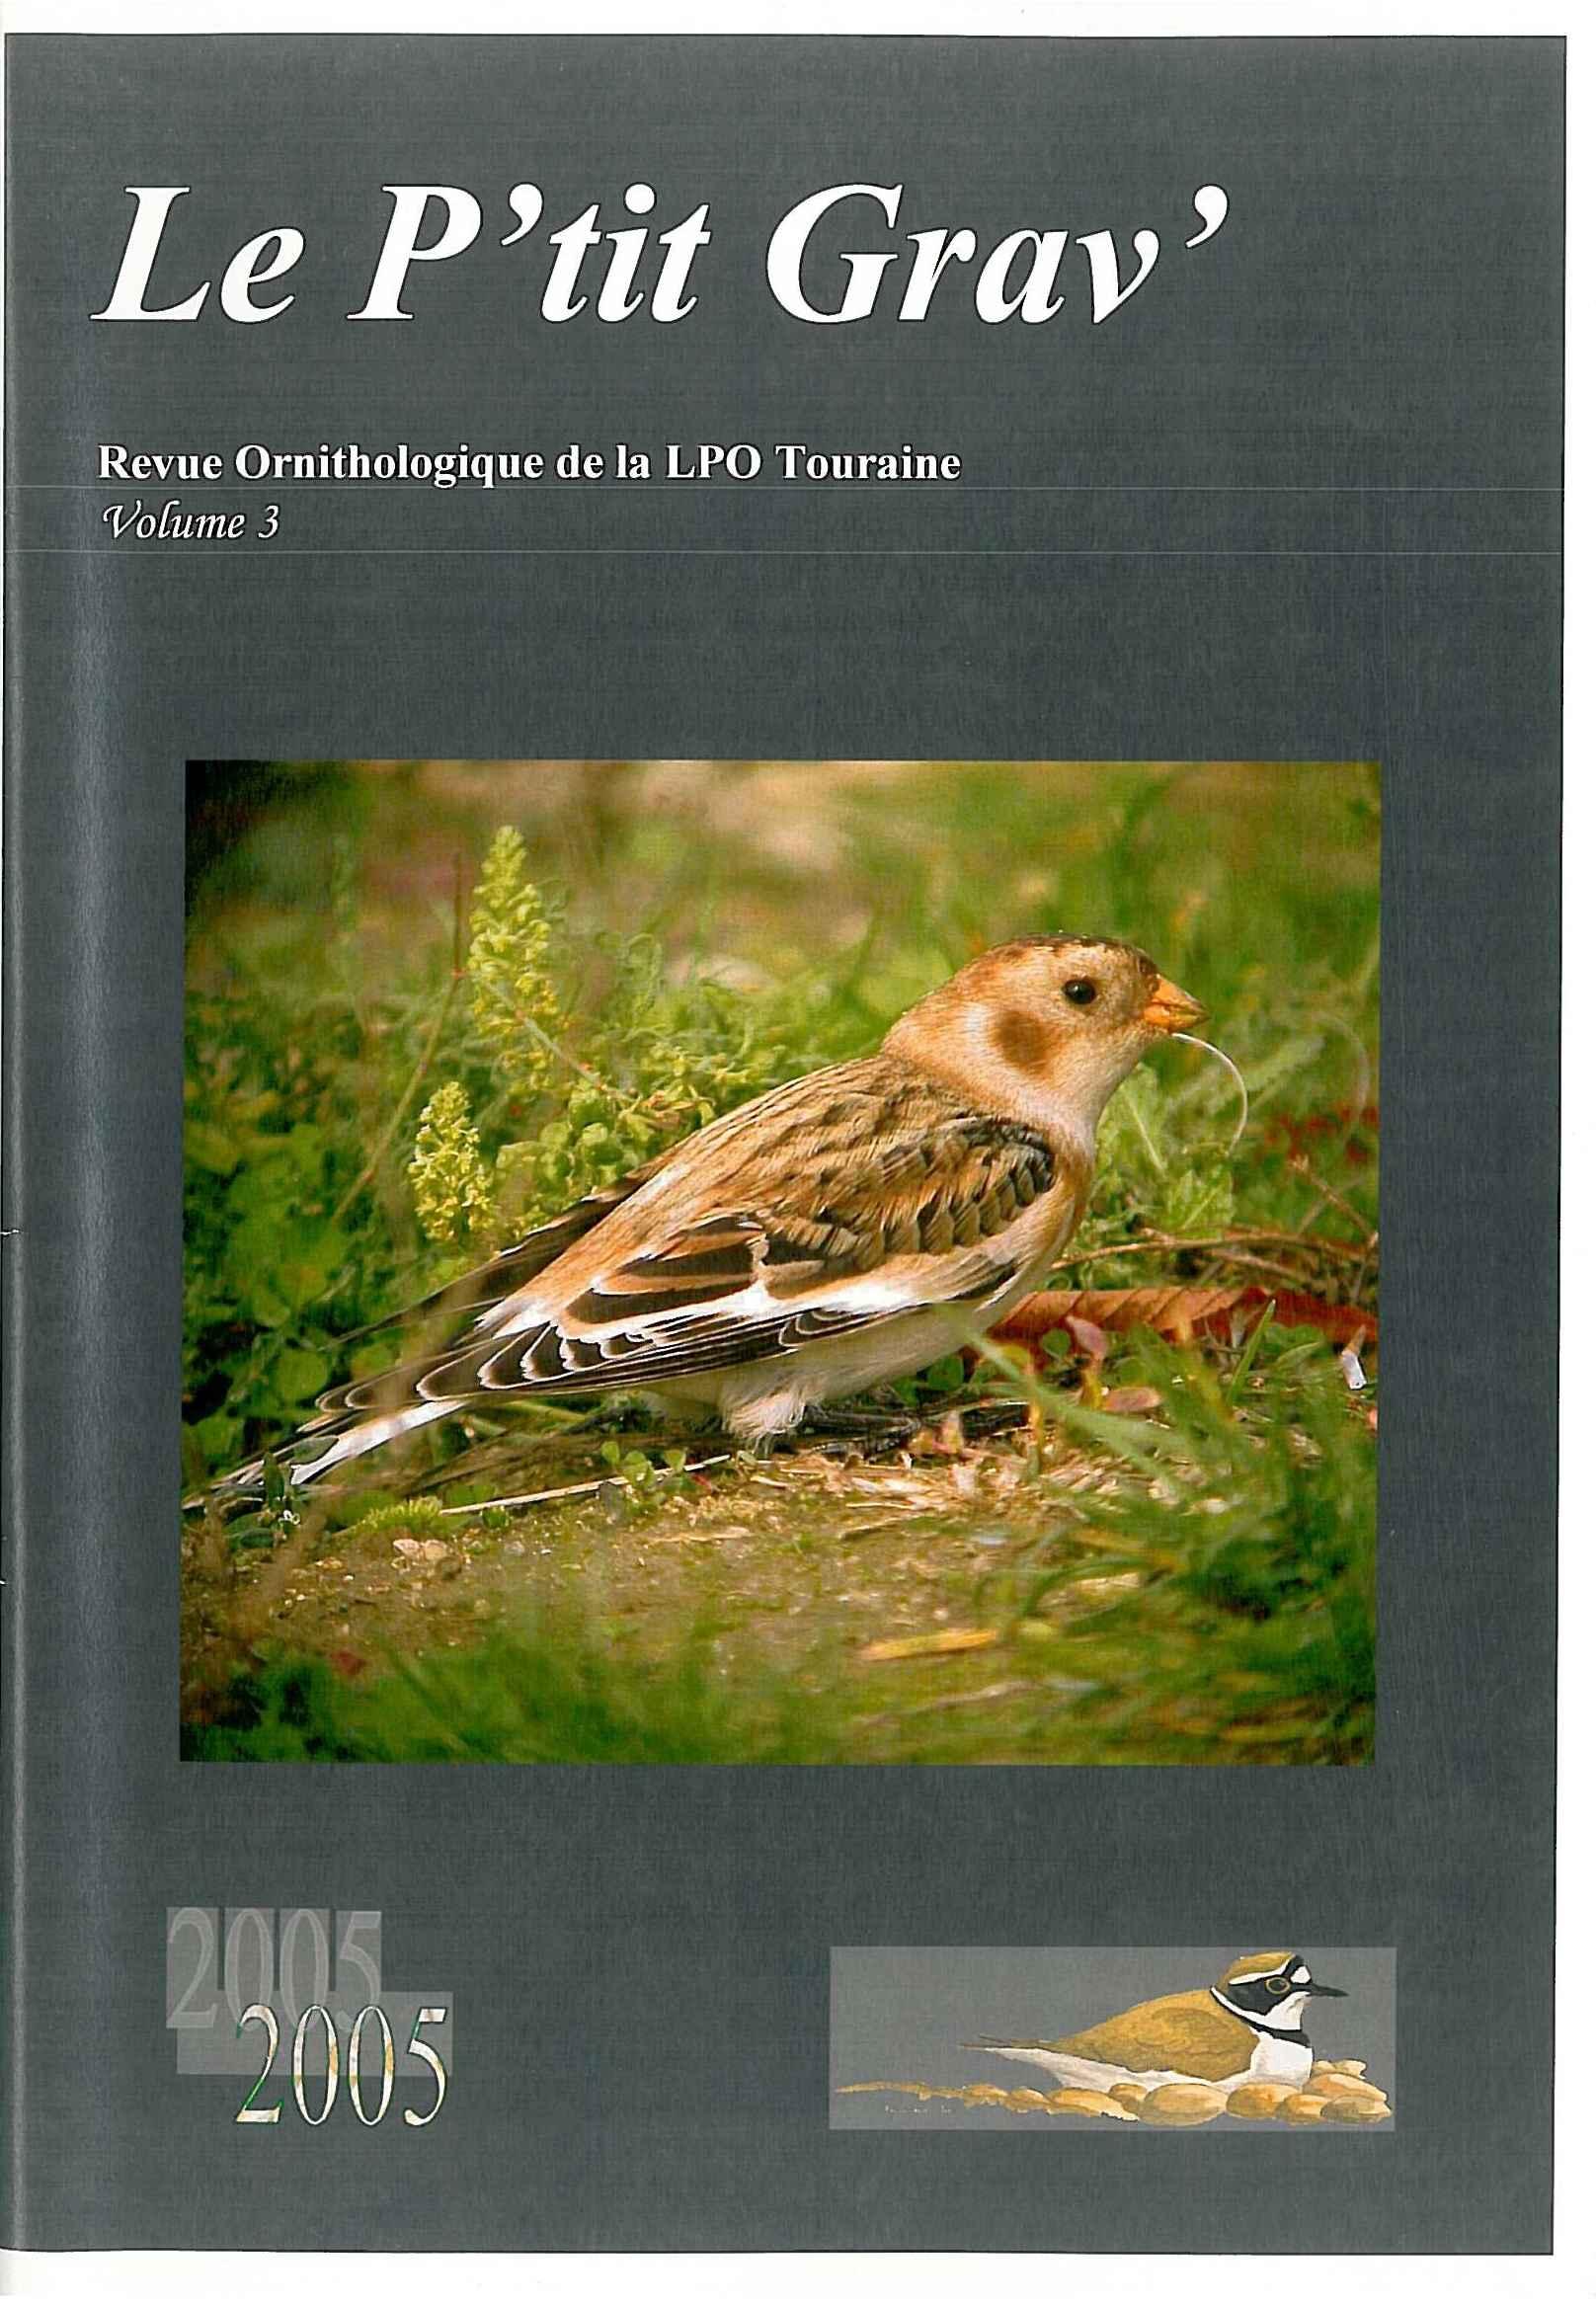 http://files.biolovision.net/www.faune-touraine.org/userfiles/MonDossier/PtitGravvol3.jpg